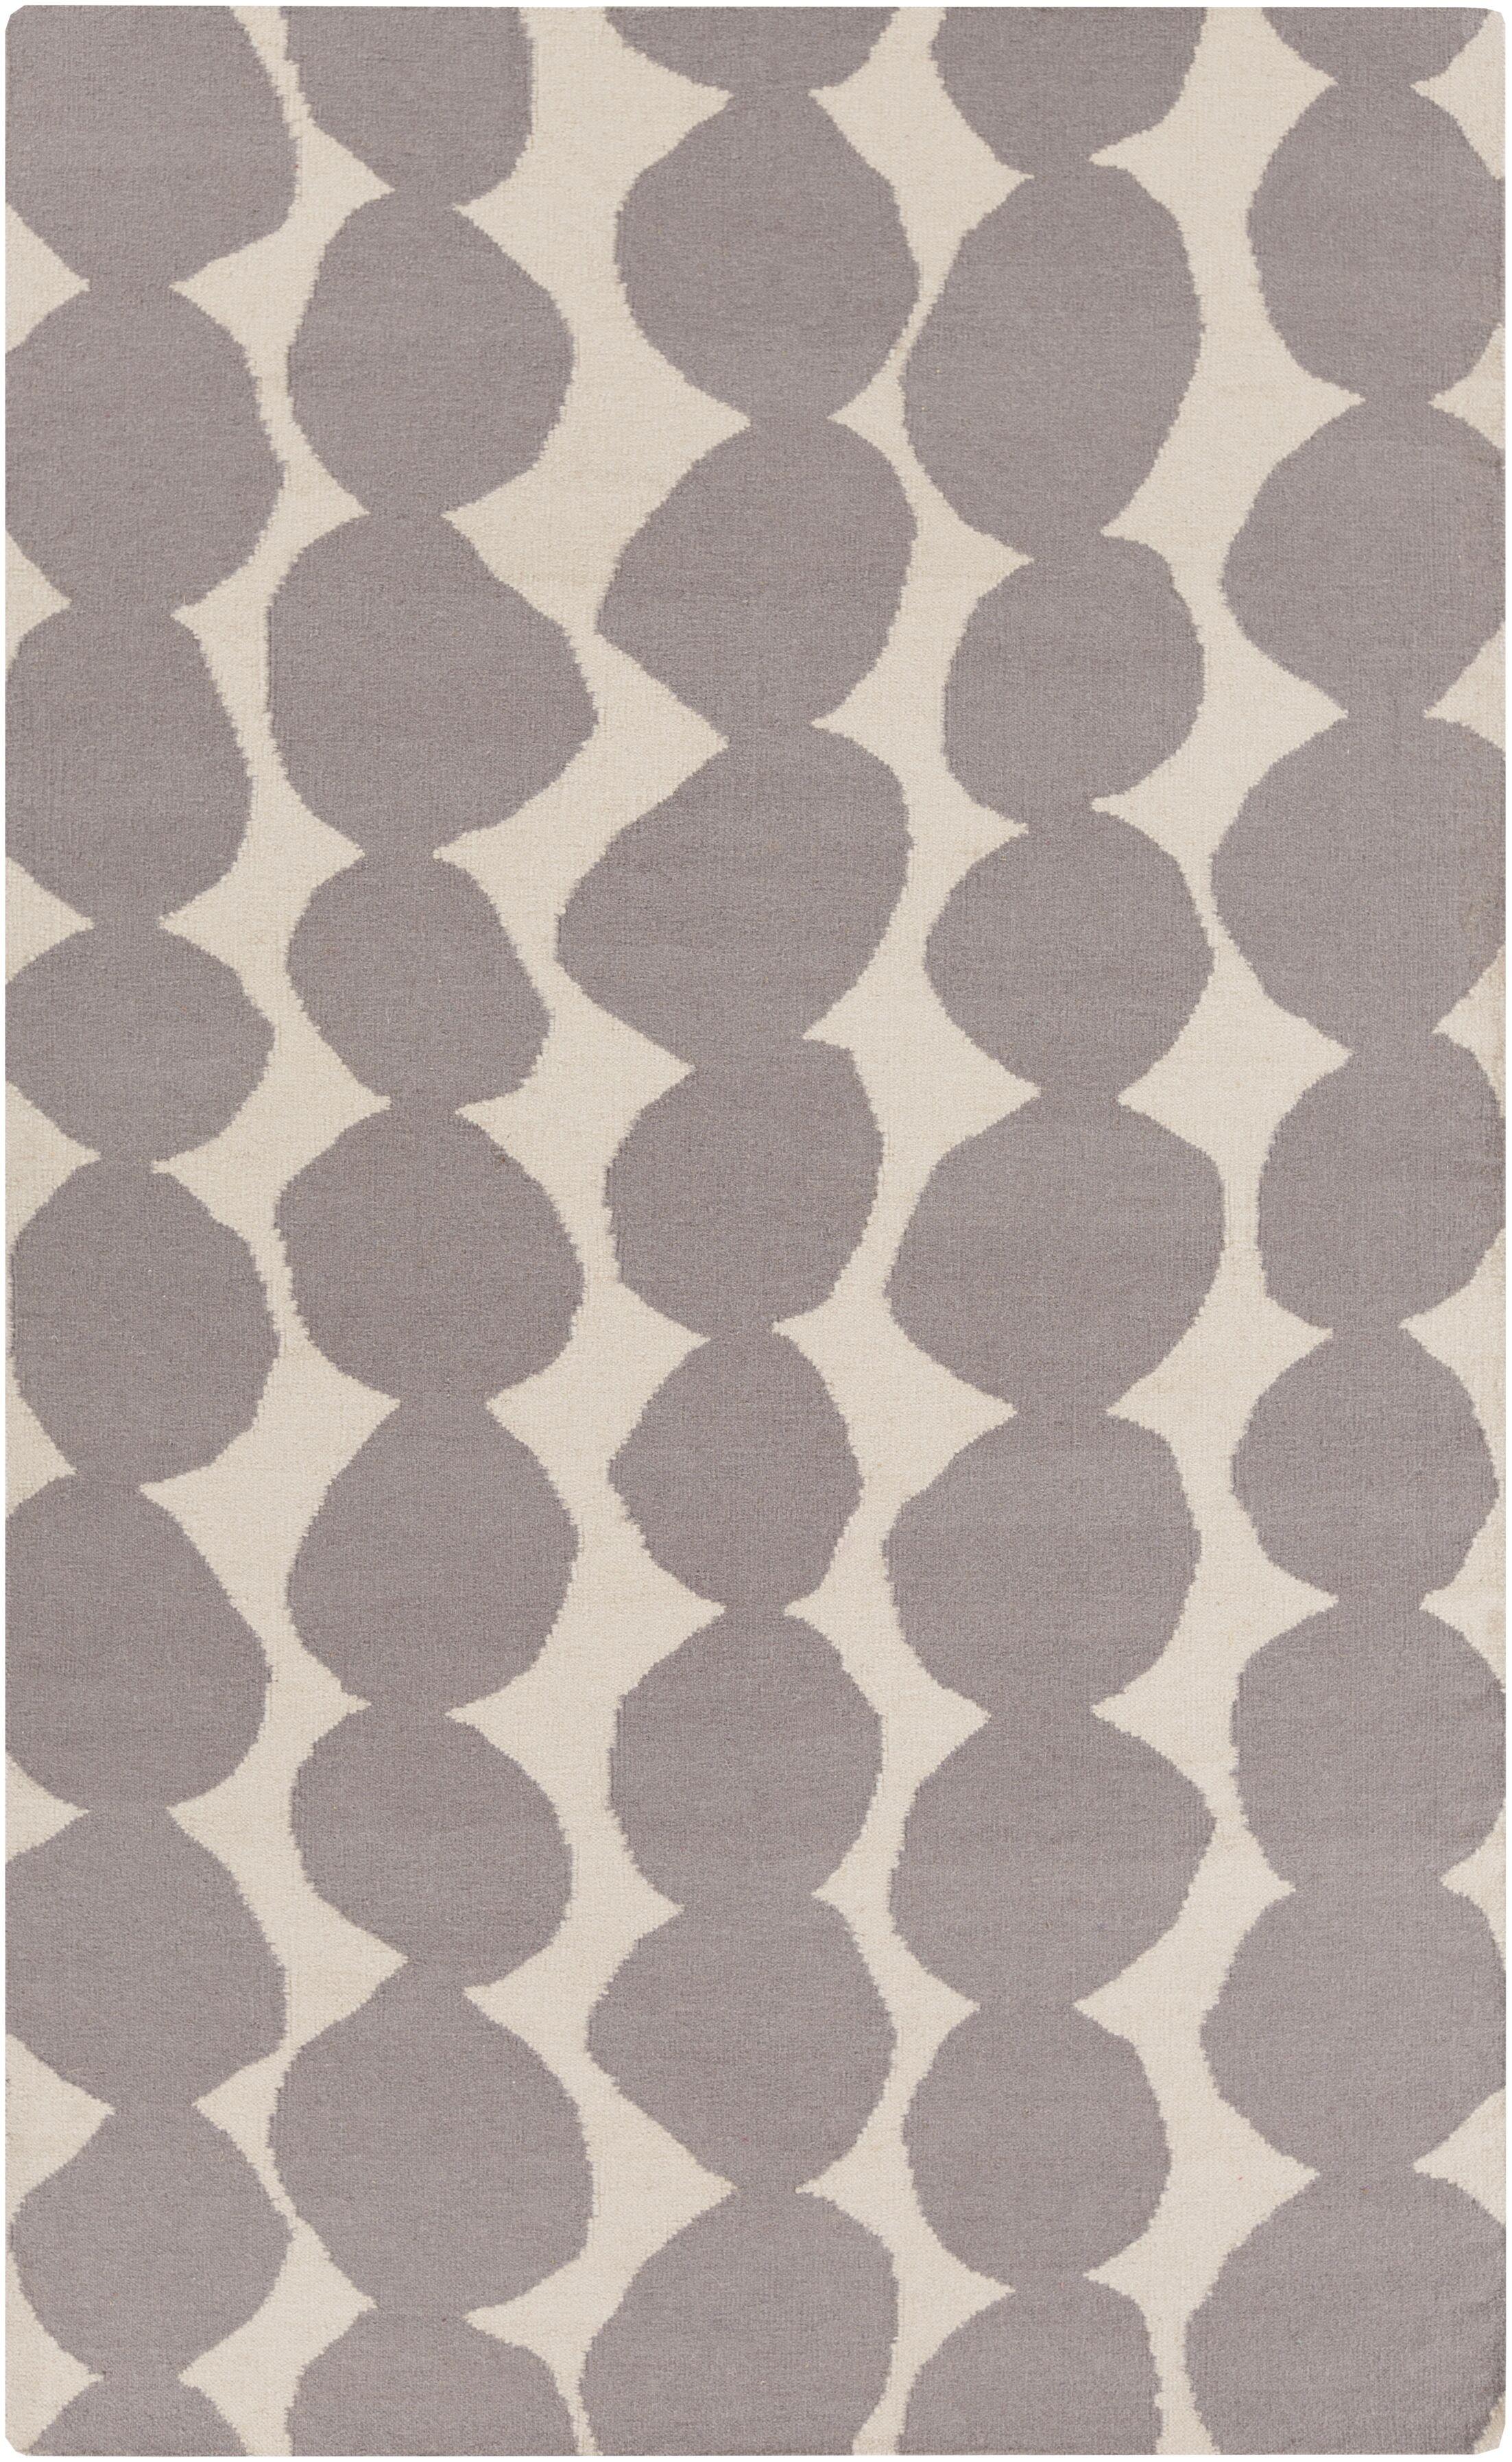 Textila Hand Woven Wool Gray Area Rug Rug Size: Rectangle 5' x 8'